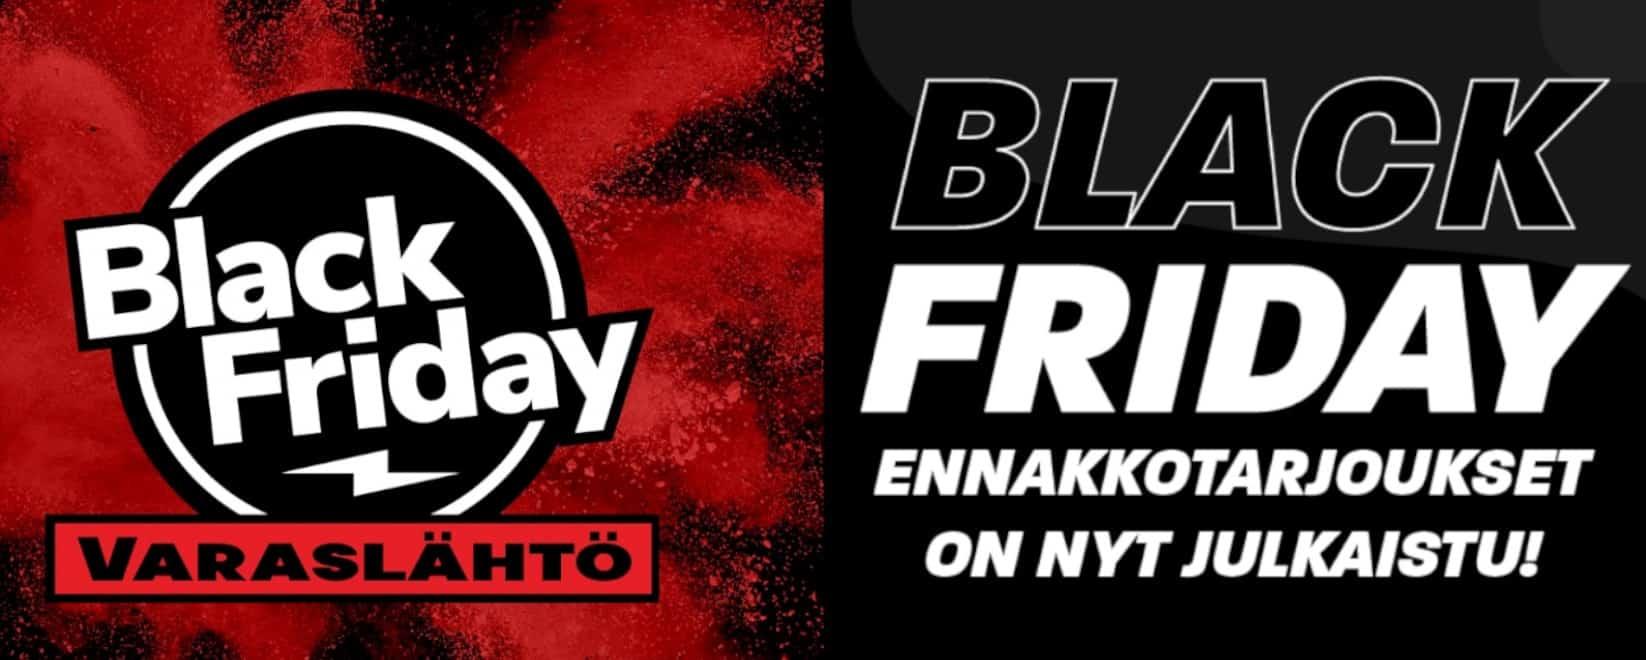 Black Friday Verkkokauppa.Com